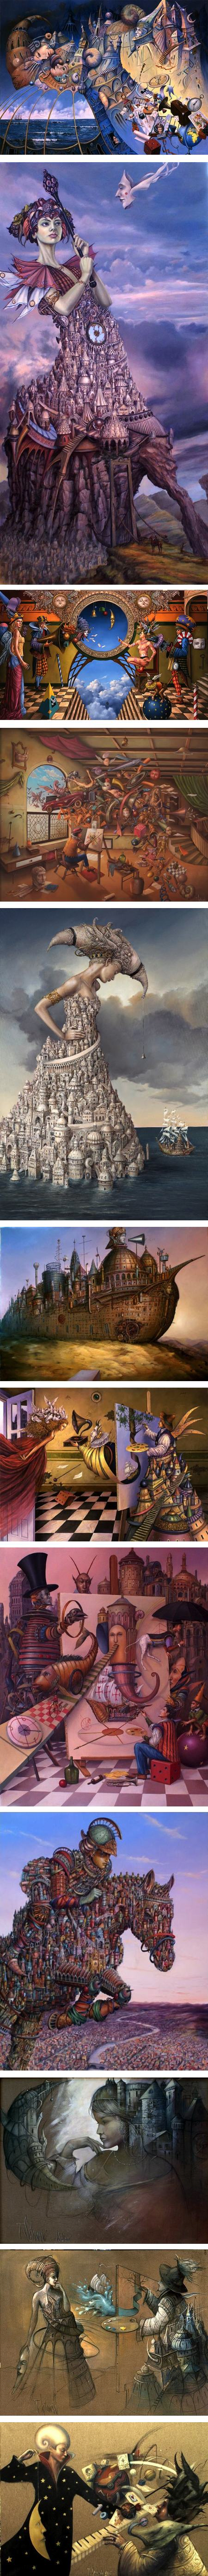 Tomek Setowski, magic realist painter